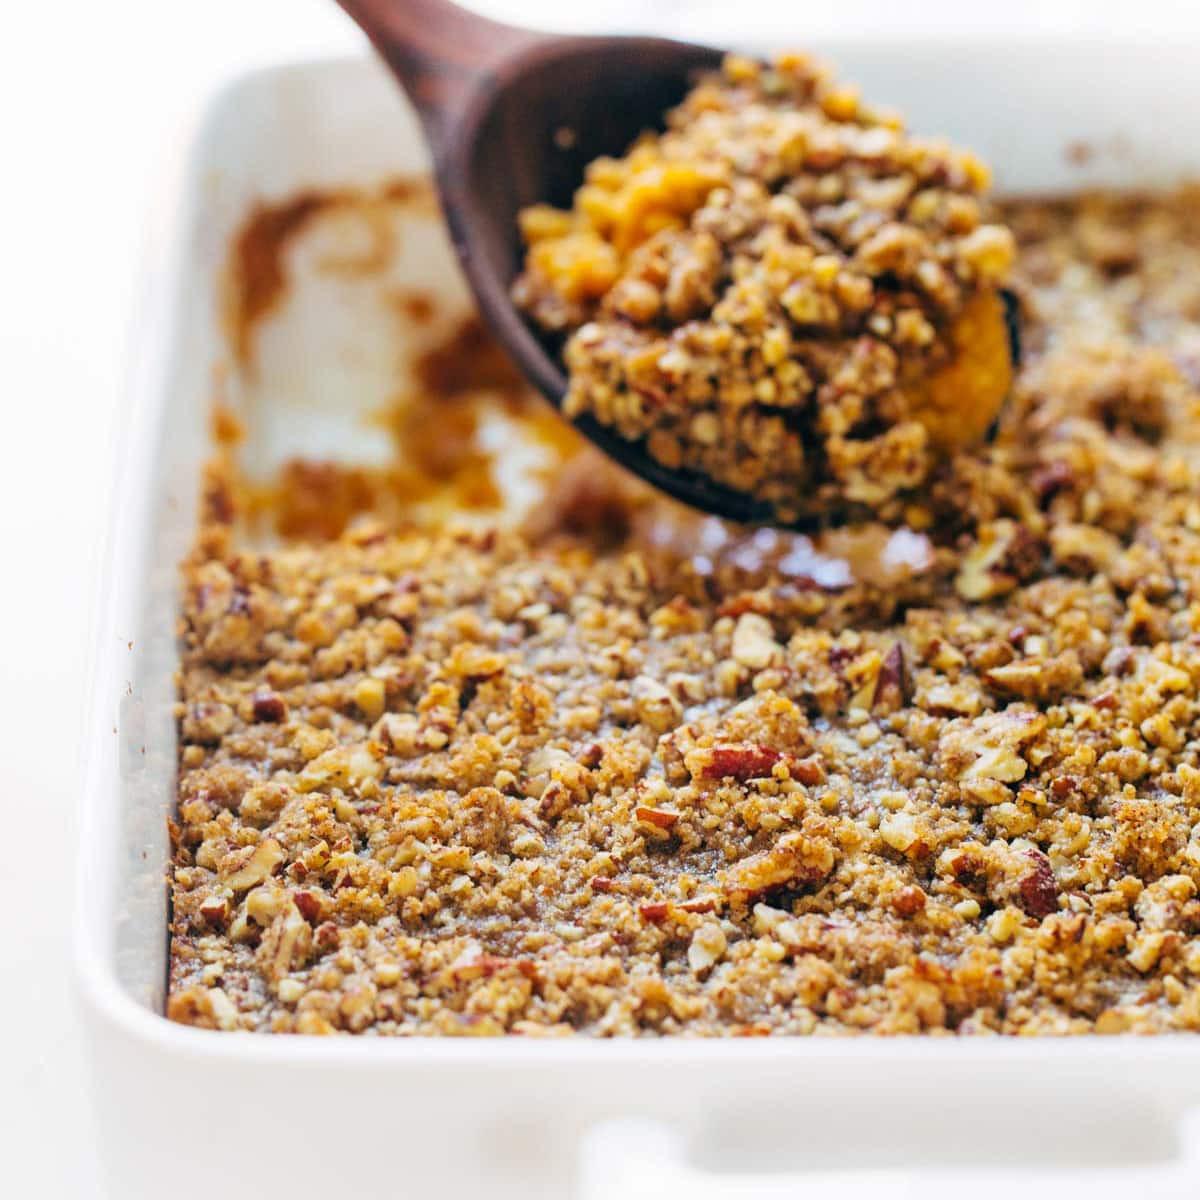 Sweet Potato Bake  Sweet Potato Casserole with Brown Sugar Topping Recipe